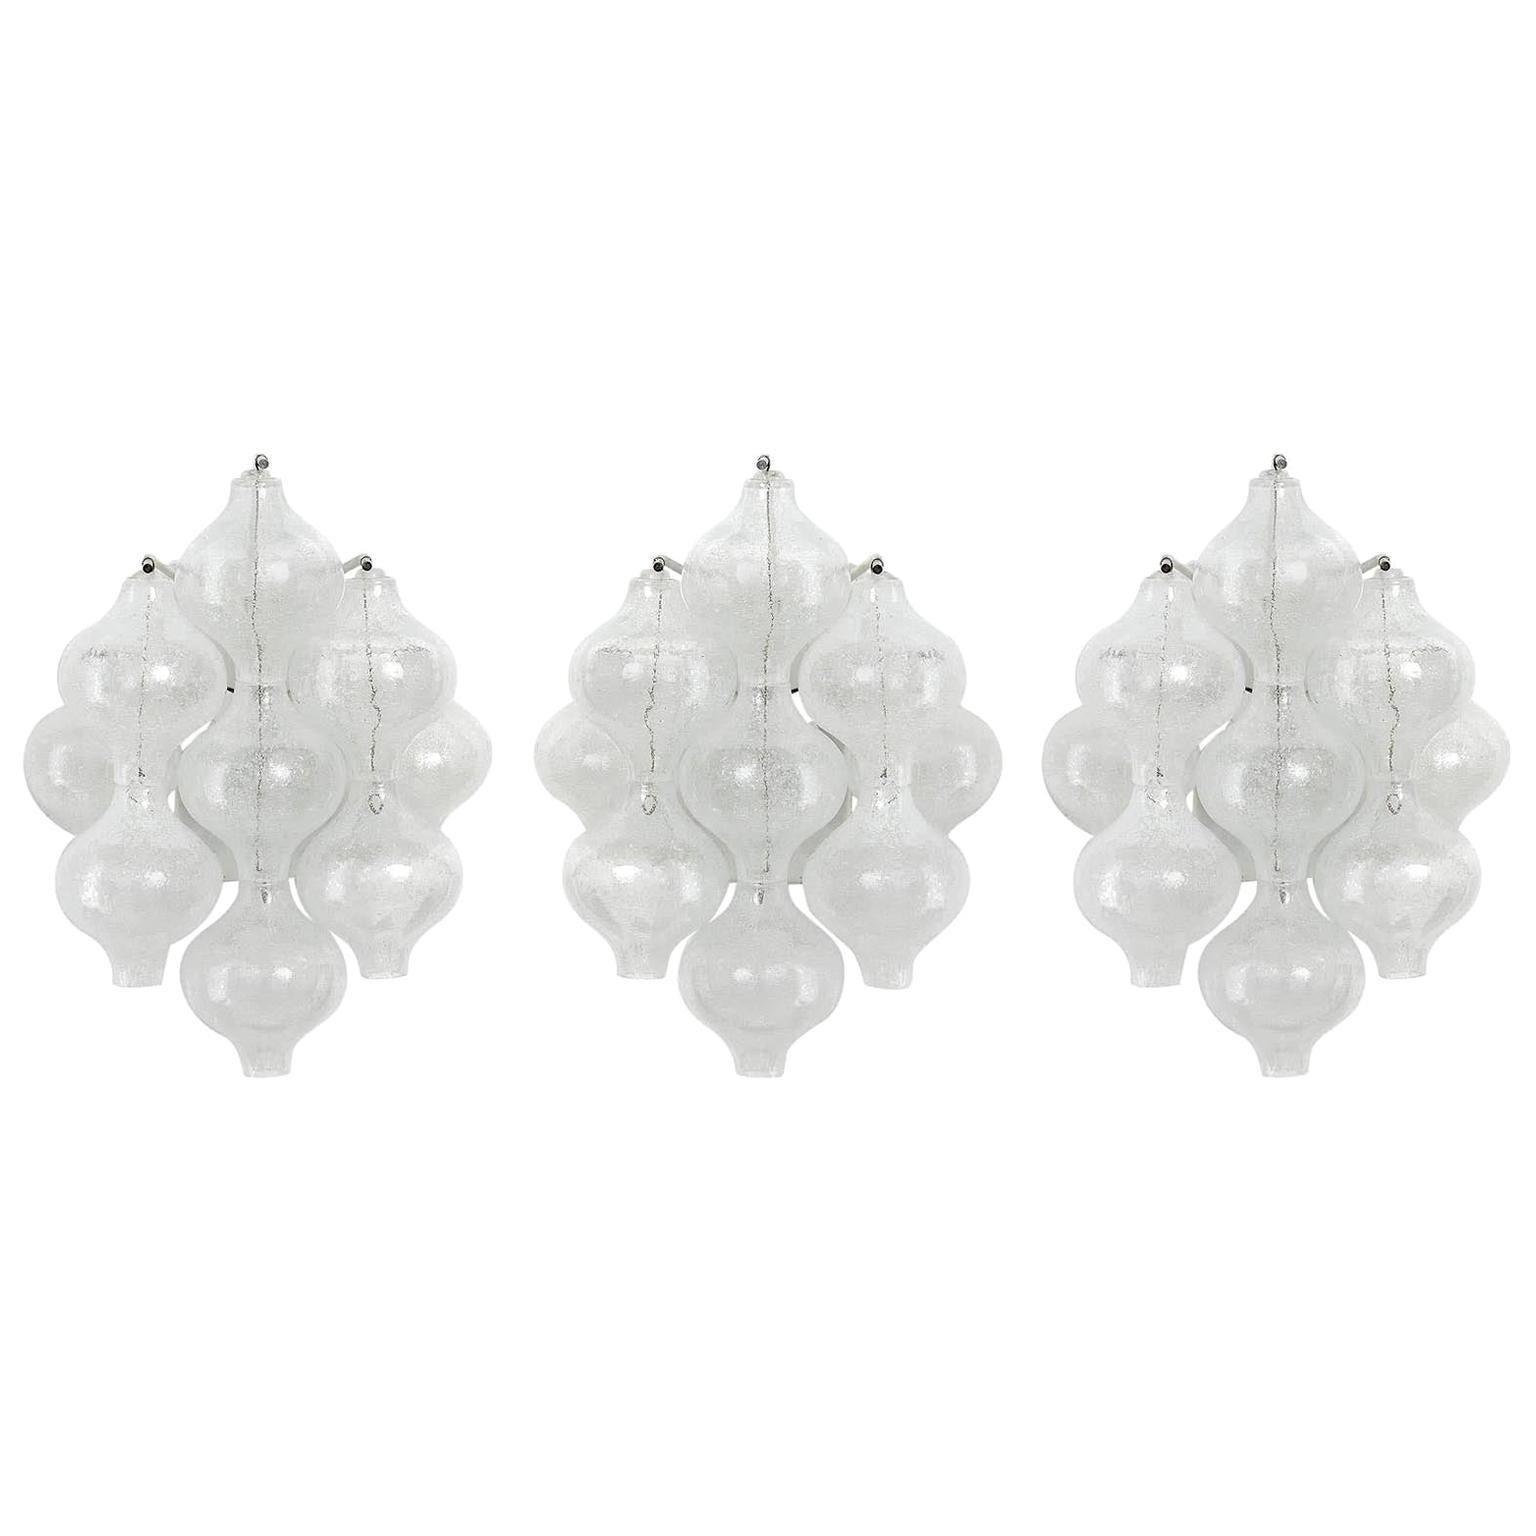 Three Kalmar 'Tulipan' Wall Lights Sconces, Bubble Glass Brass, 1970s